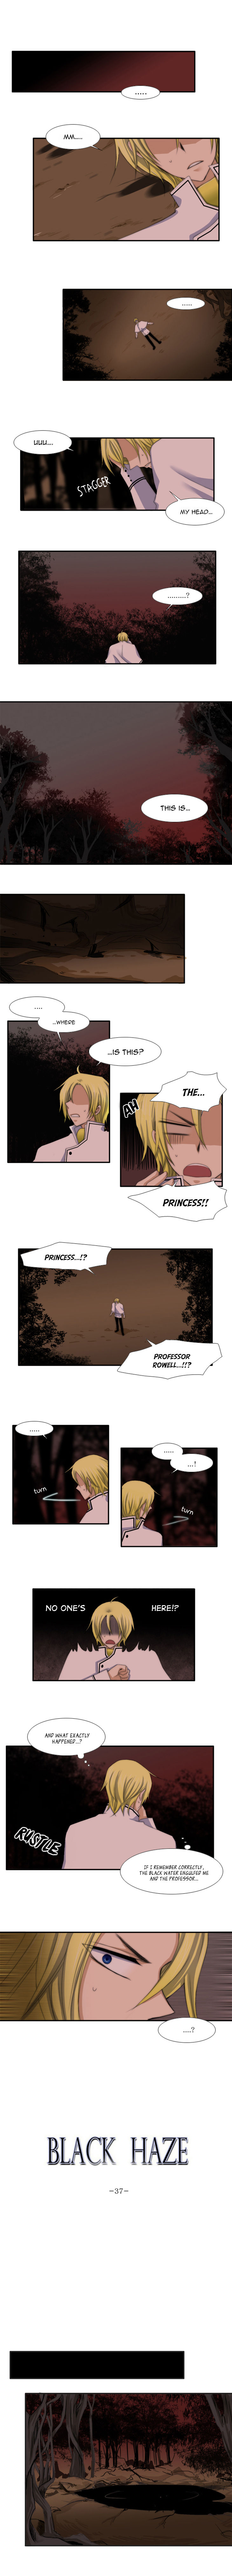 Black Haze 37 Page 2